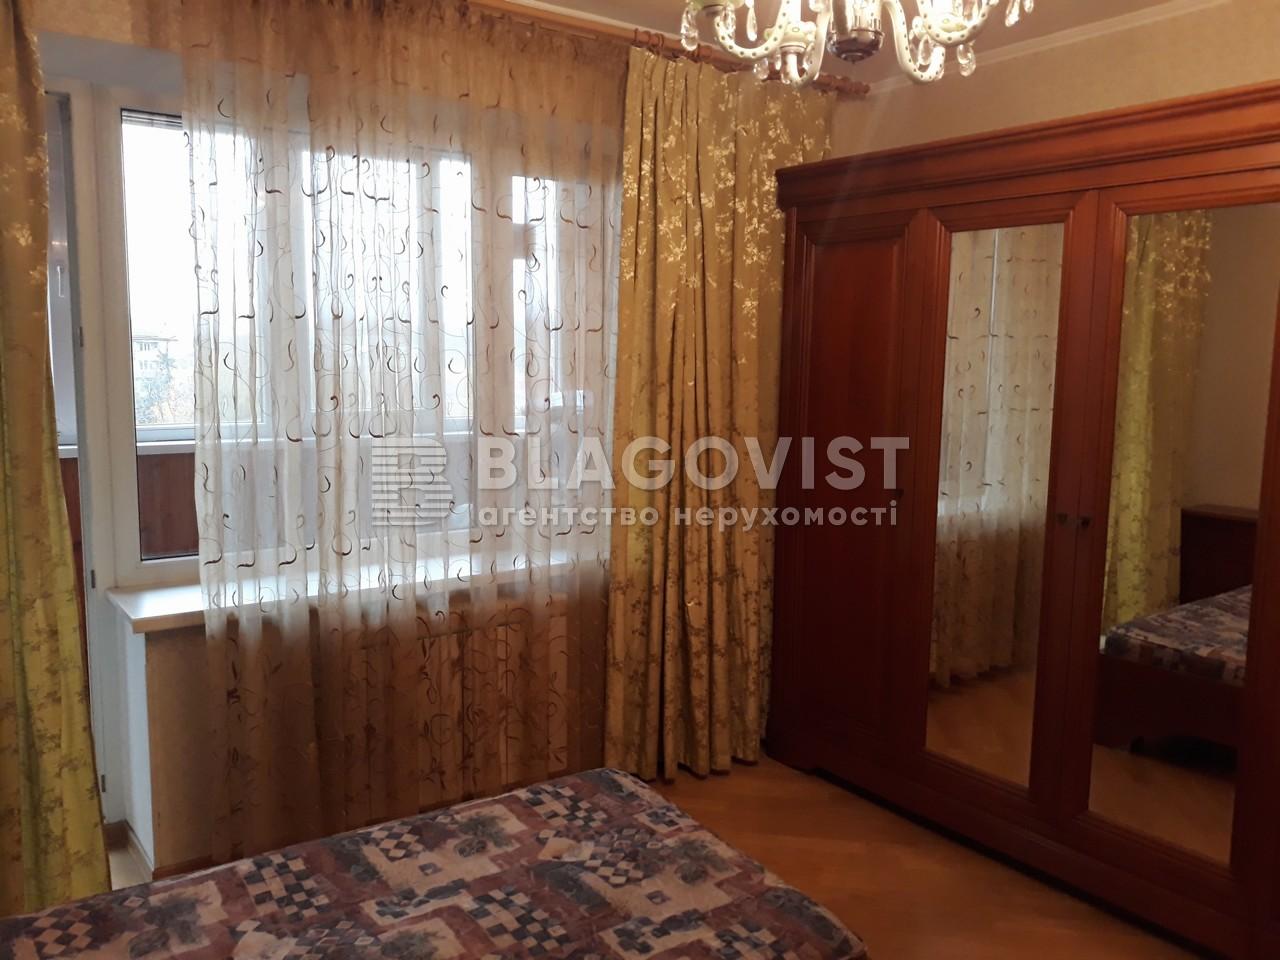 Квартира H-42936, Антоновича (Горького), 110, Київ - Фото 3